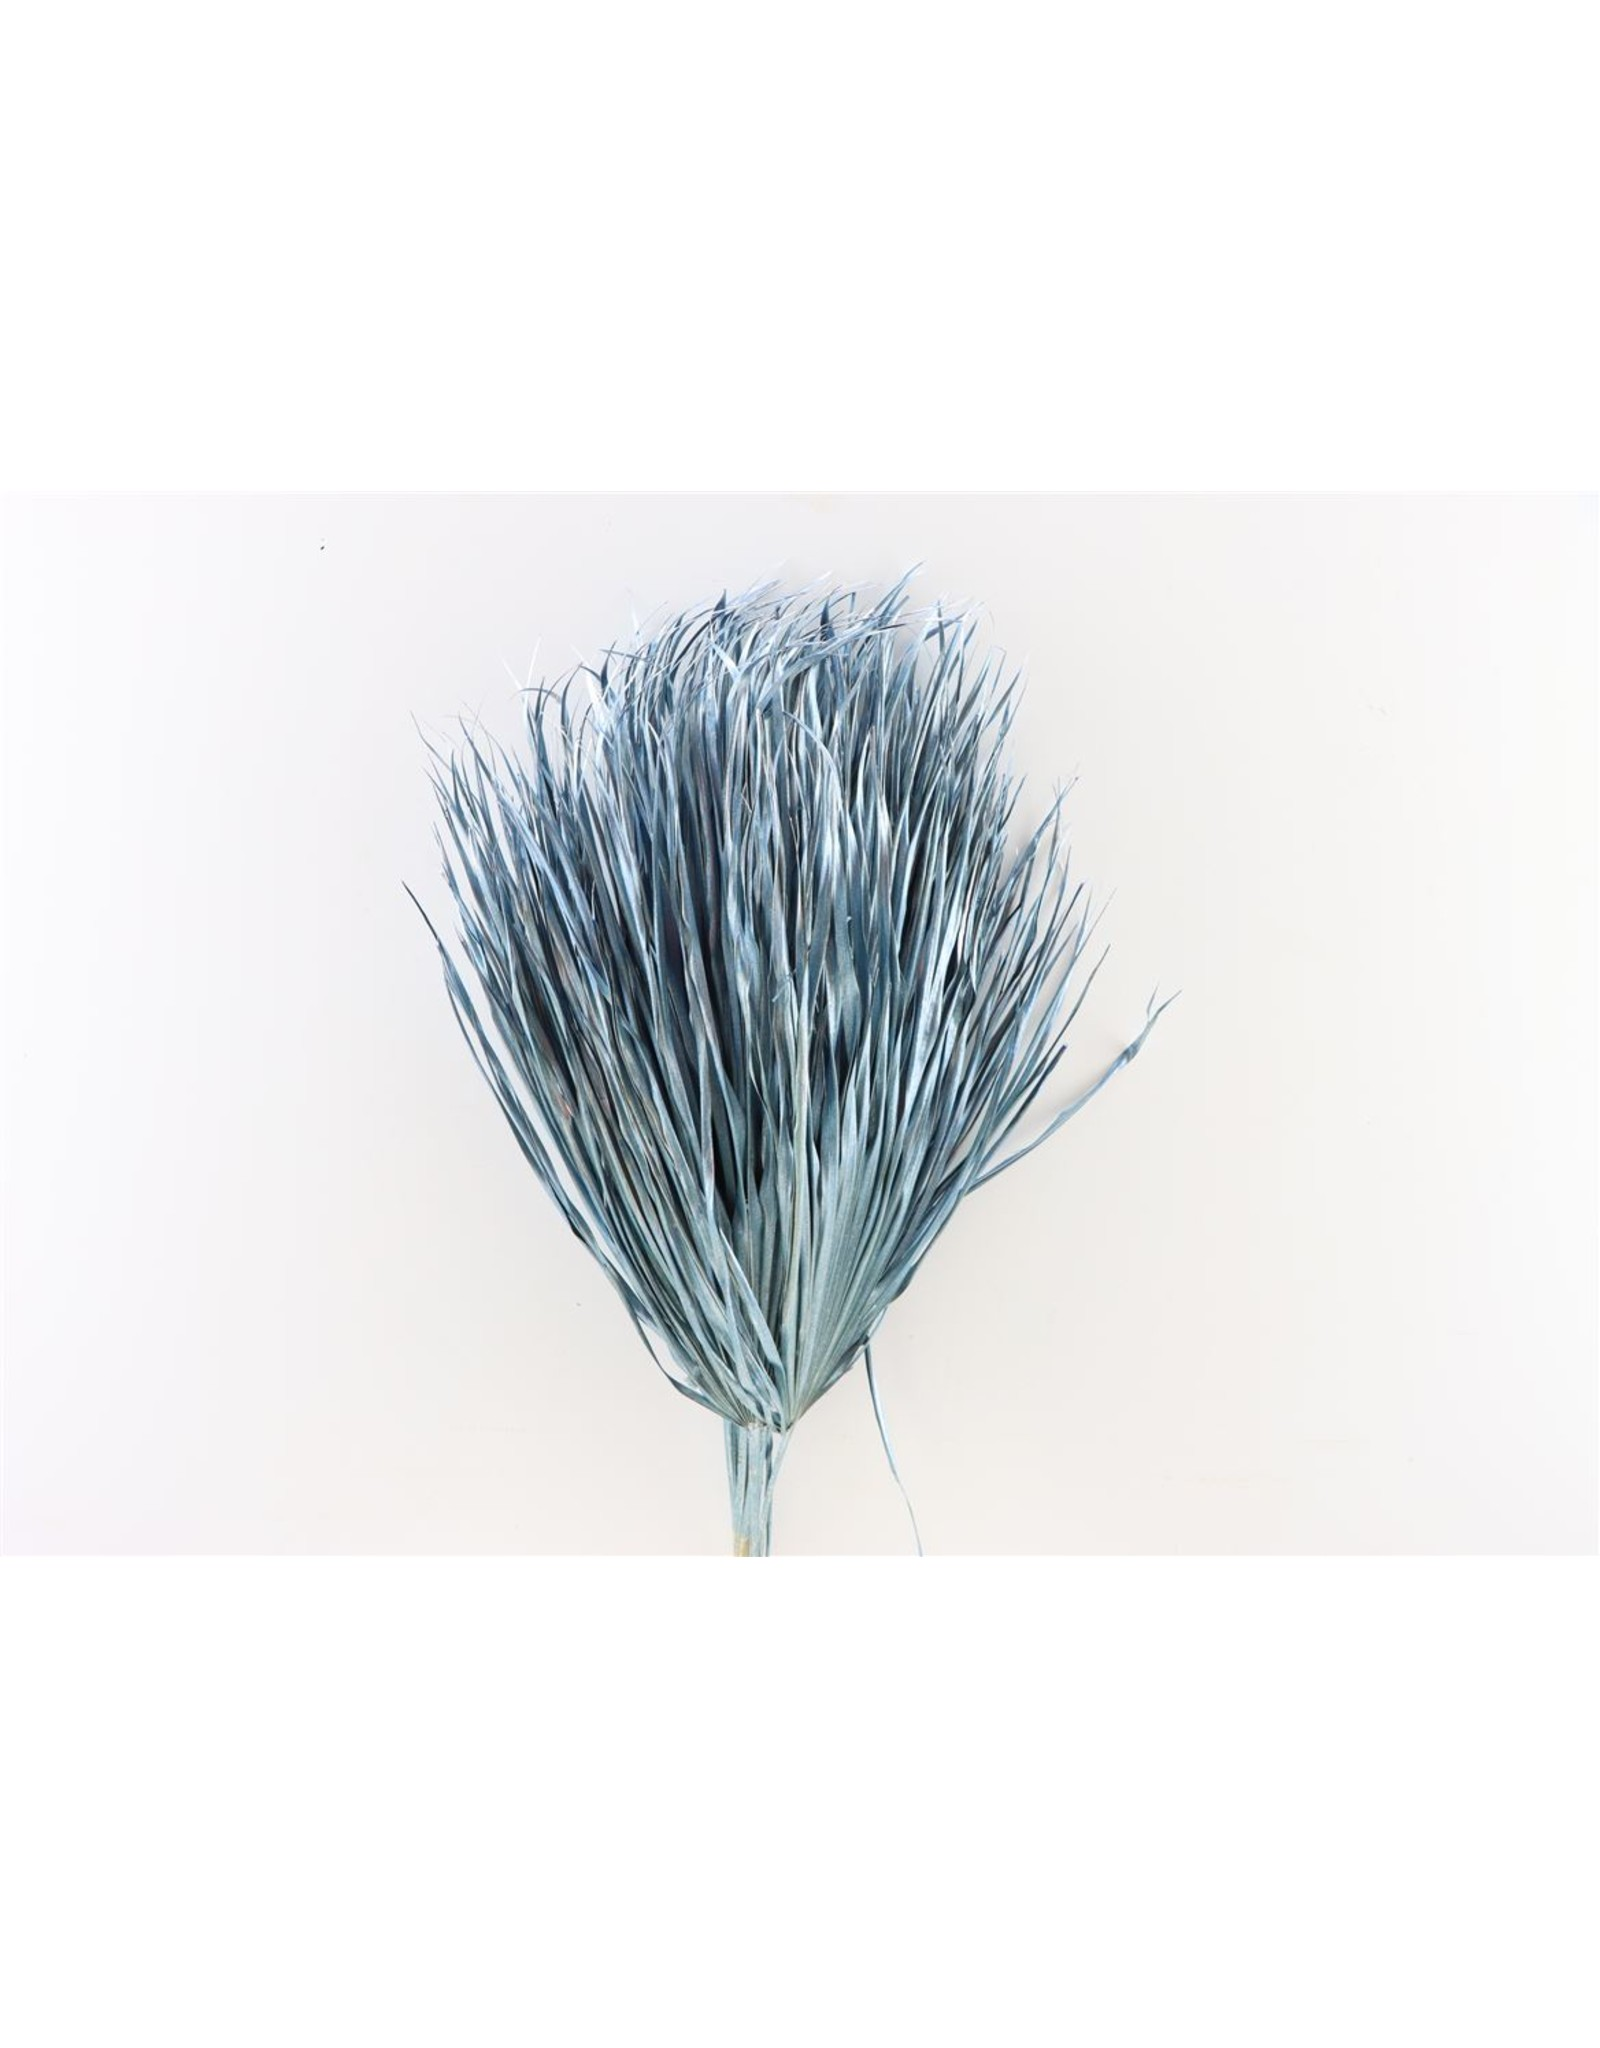 GF Dried Chamaerops (10tk) Metalic Blue Bunch x 2